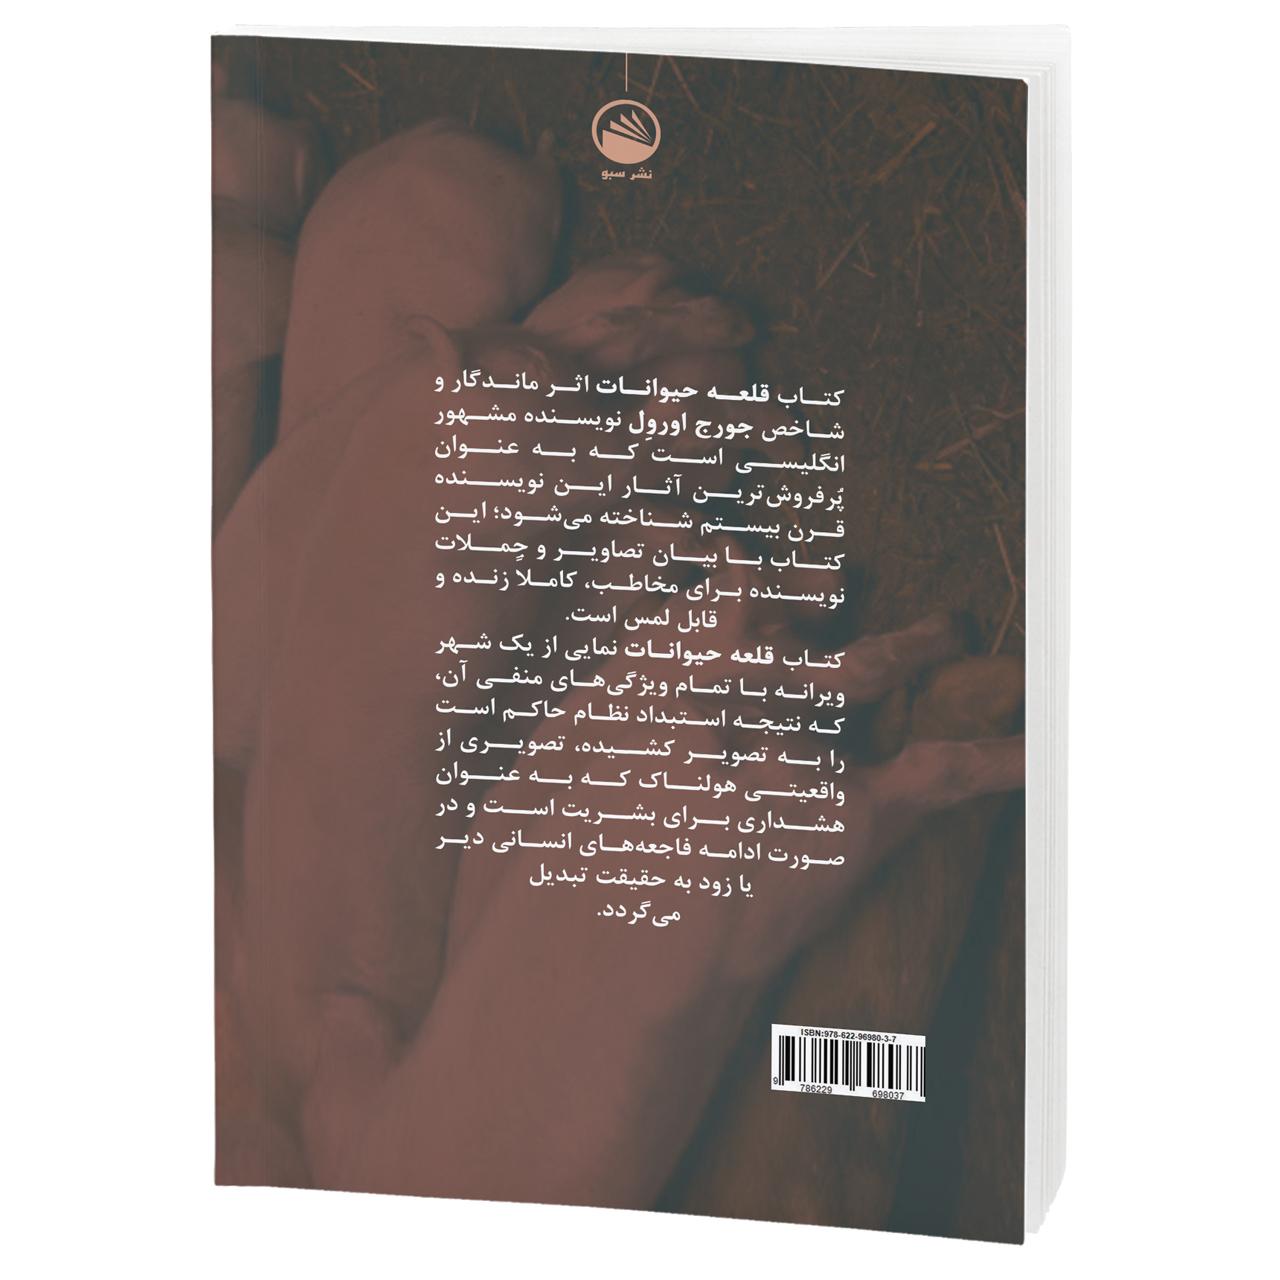 کتاب قلعه حیوانات اثر جورج اورول نشر سبو main 1 2